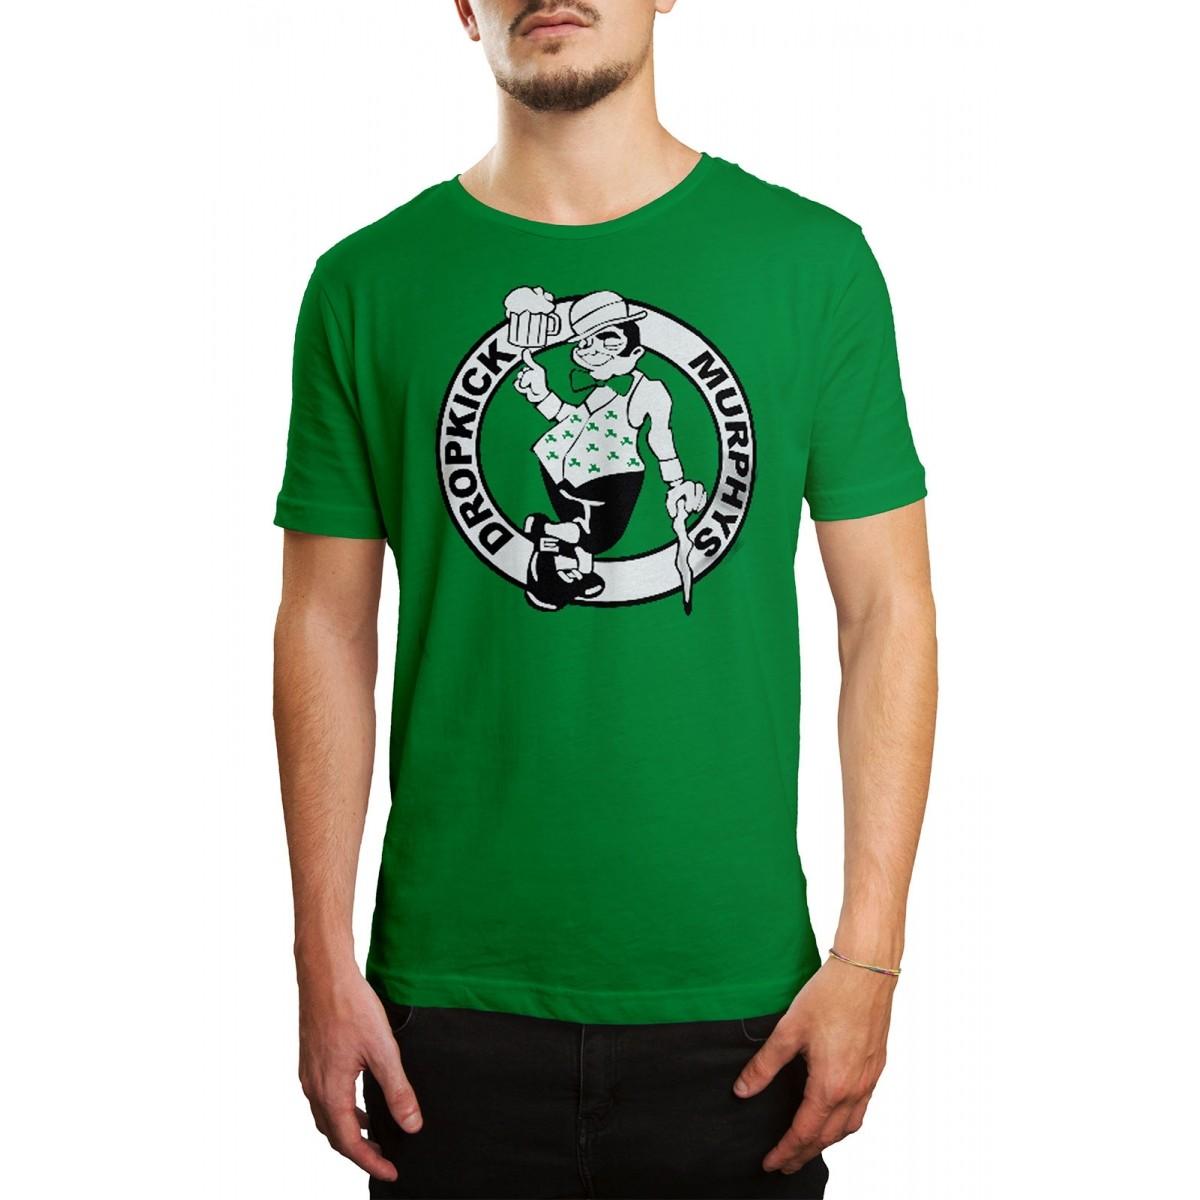 Camiseta Dropkick Murphys  - HShop